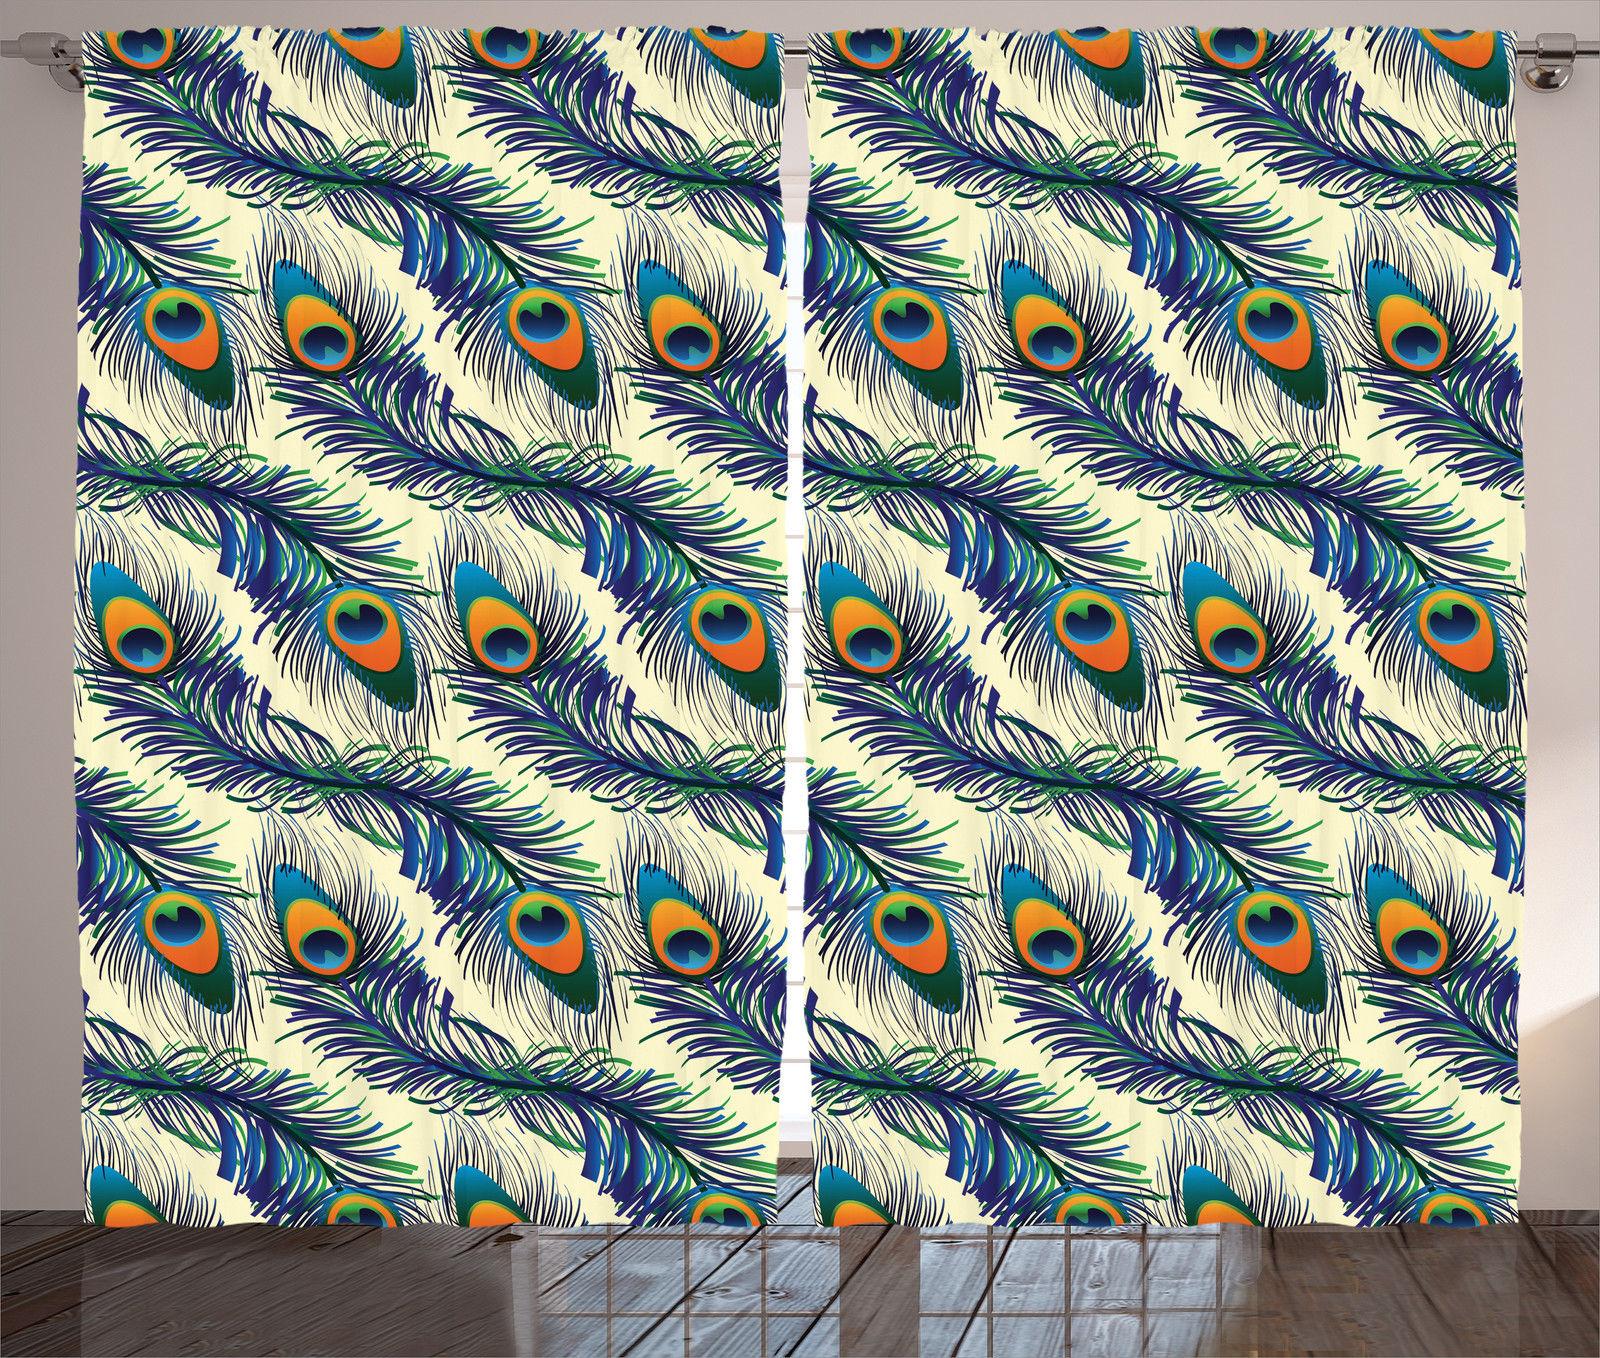 Peacock Feathers Pattern Vintage Style Ornamental Artprint